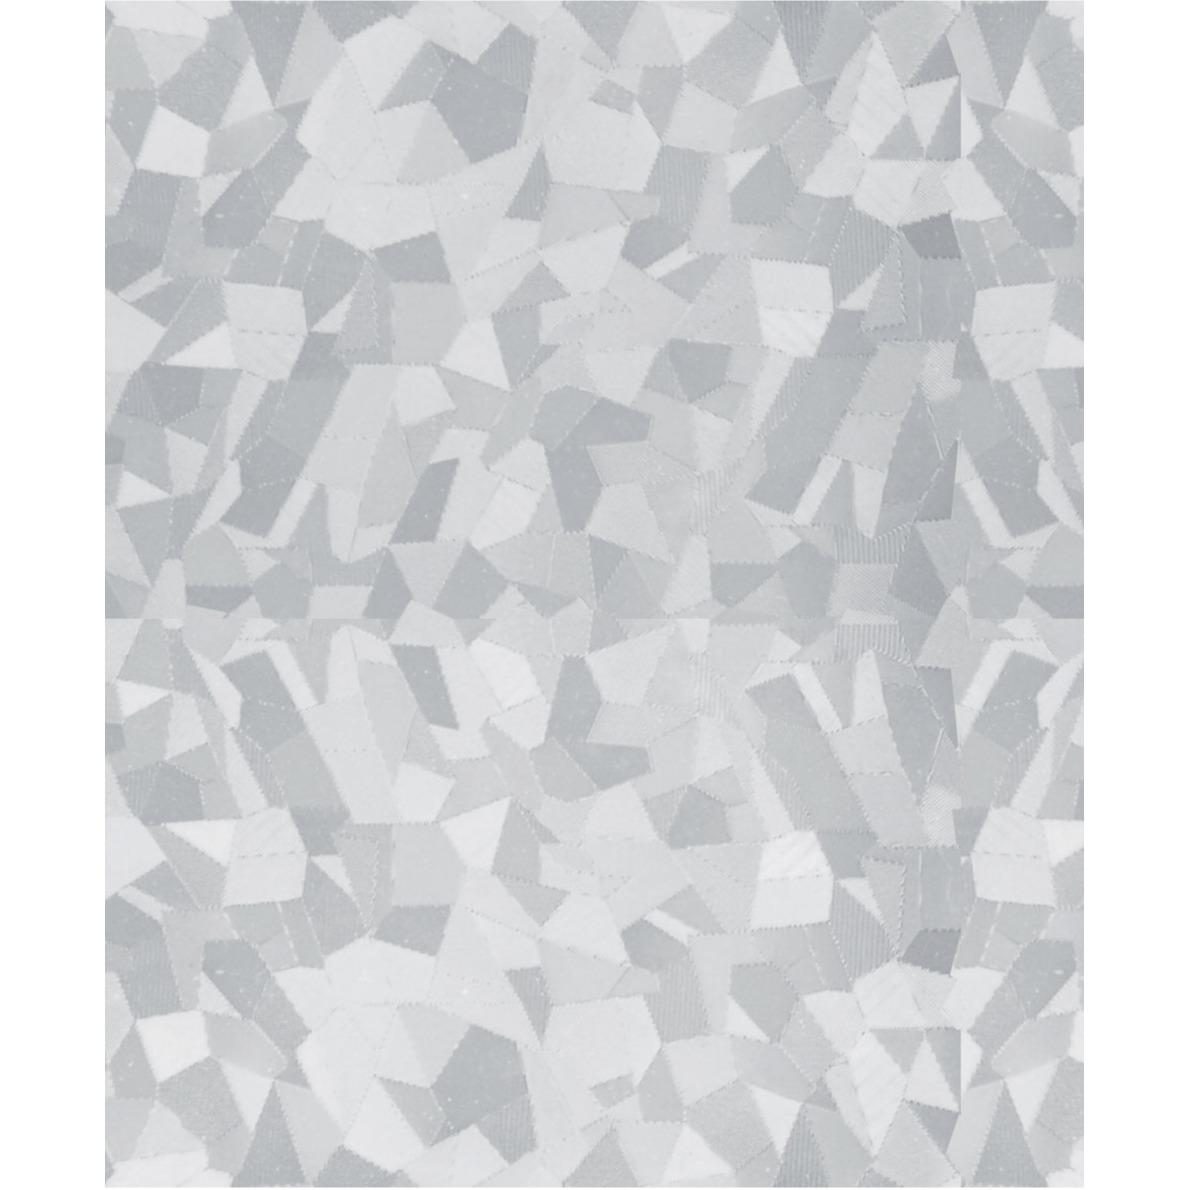 Raamfolie stenen semi transparant 45 cm x 2 meter statisch